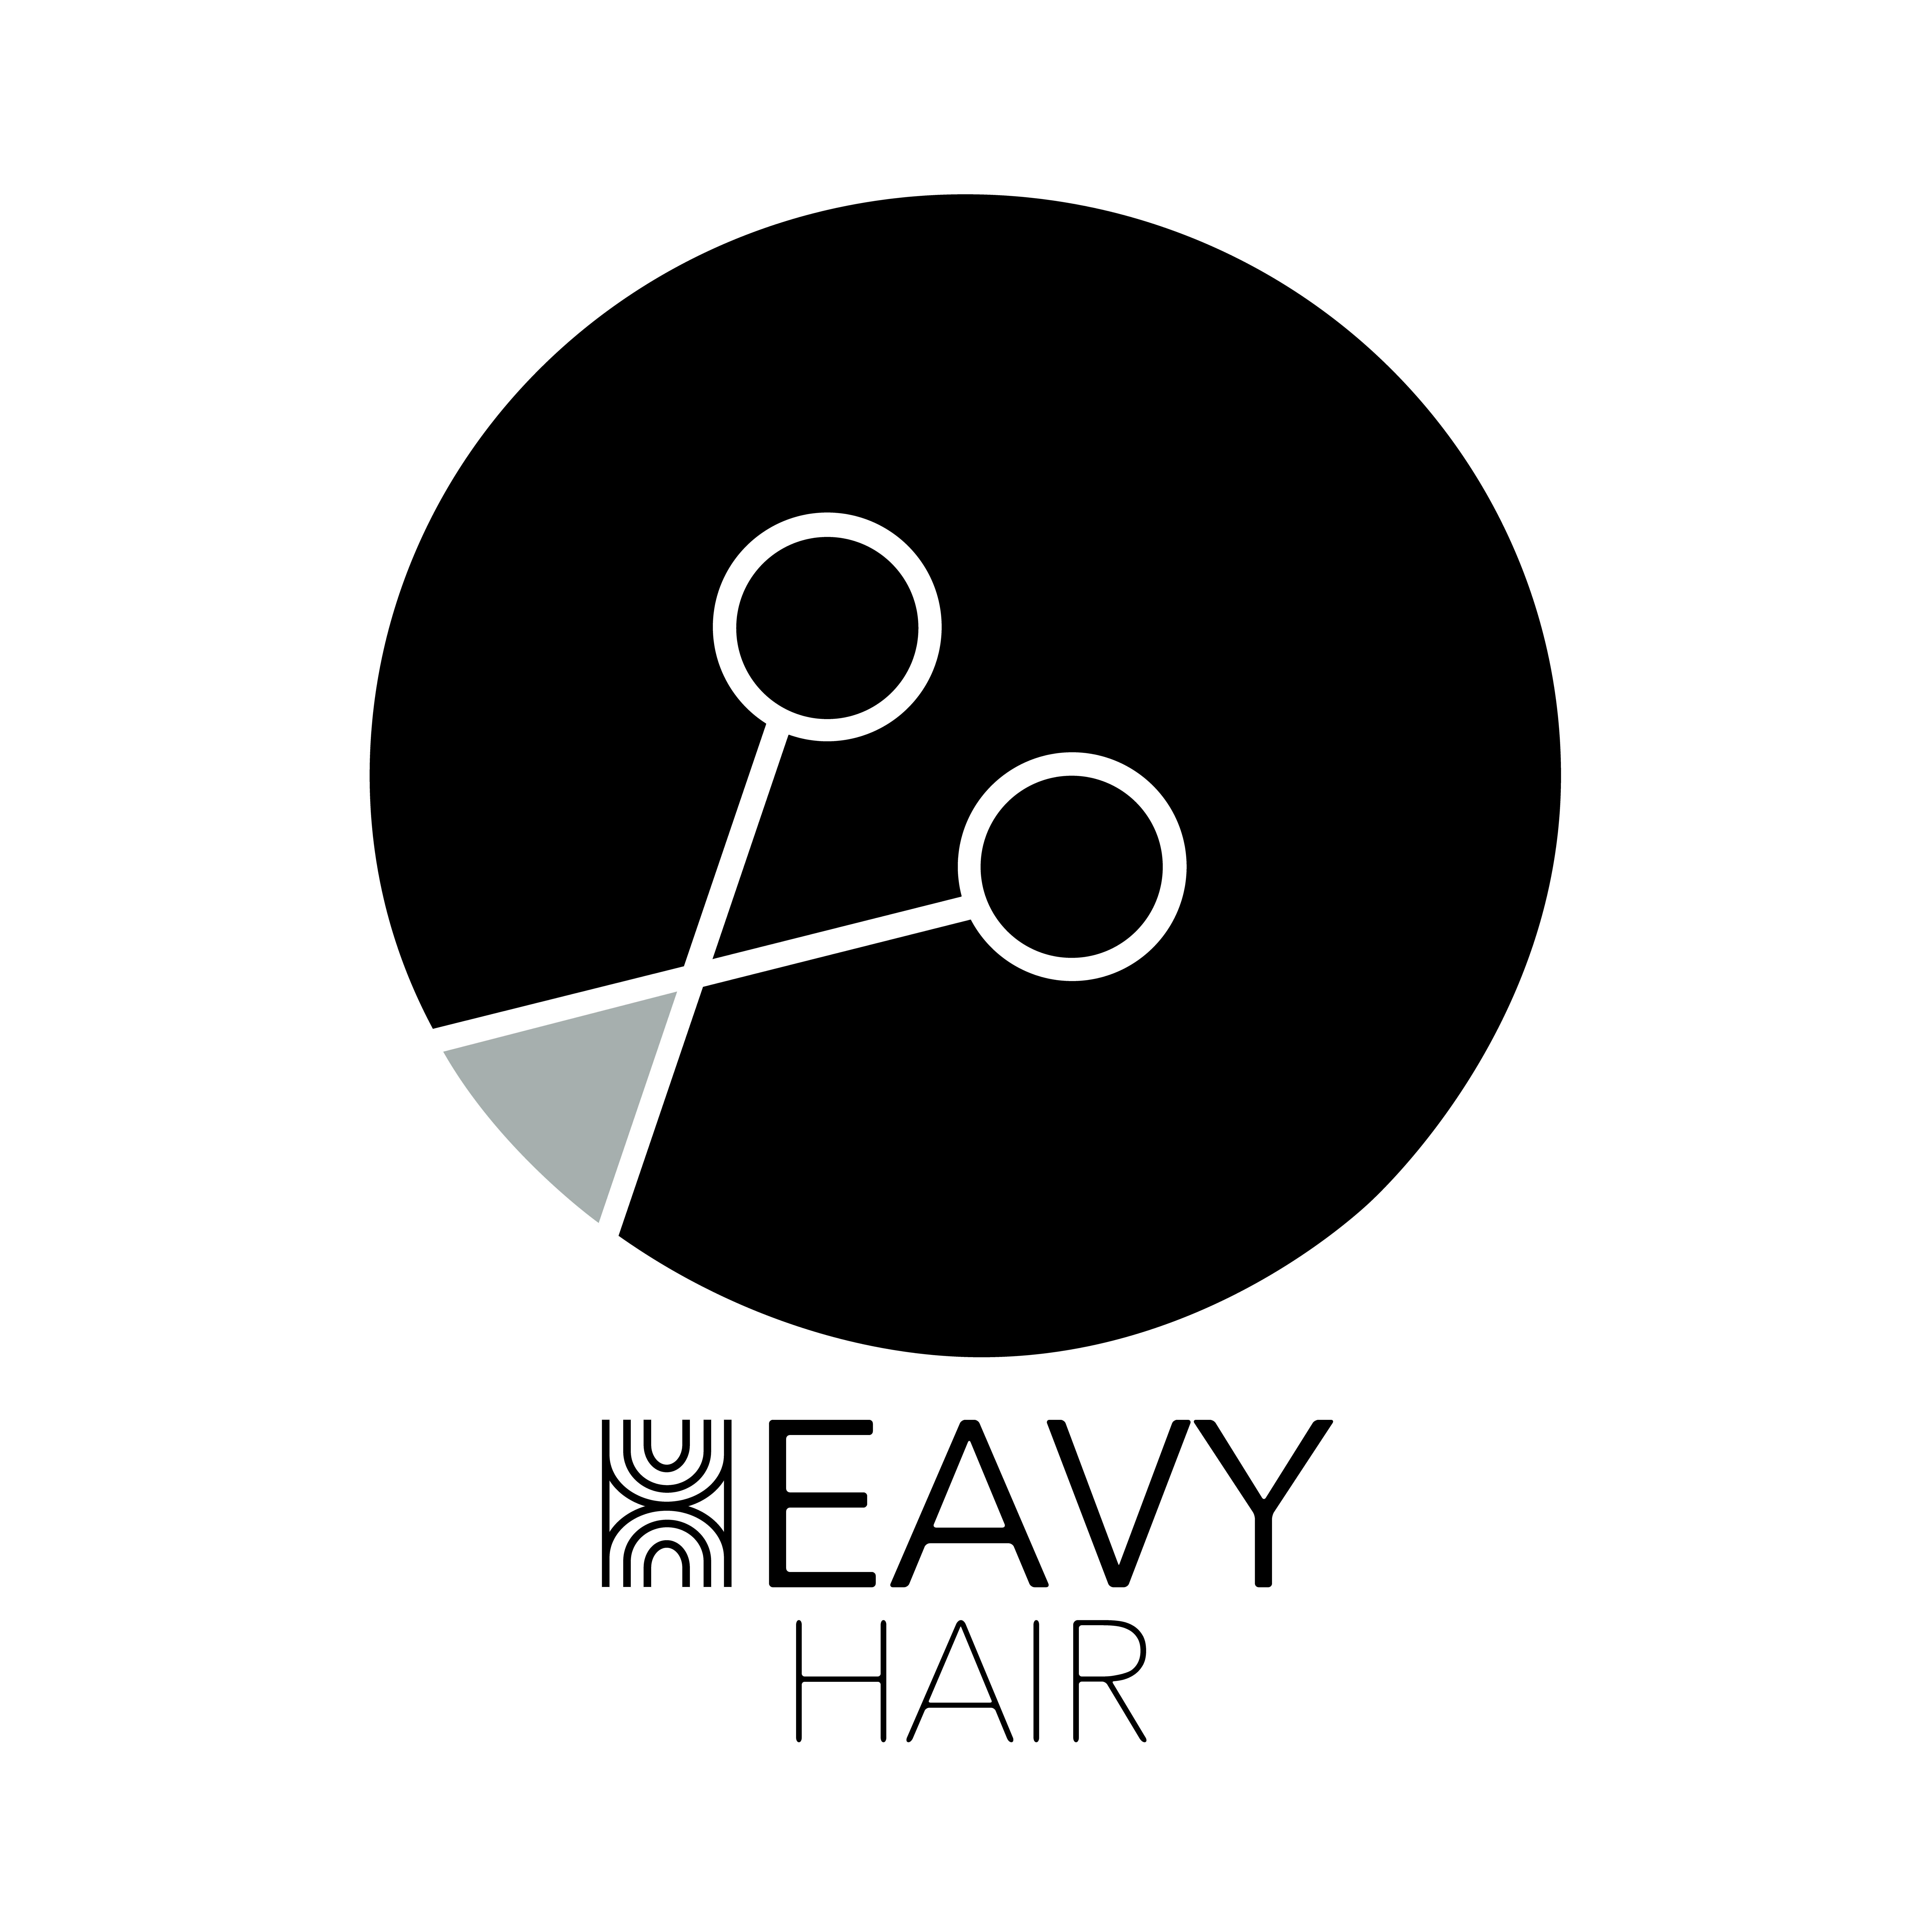 Heavy Hair logo